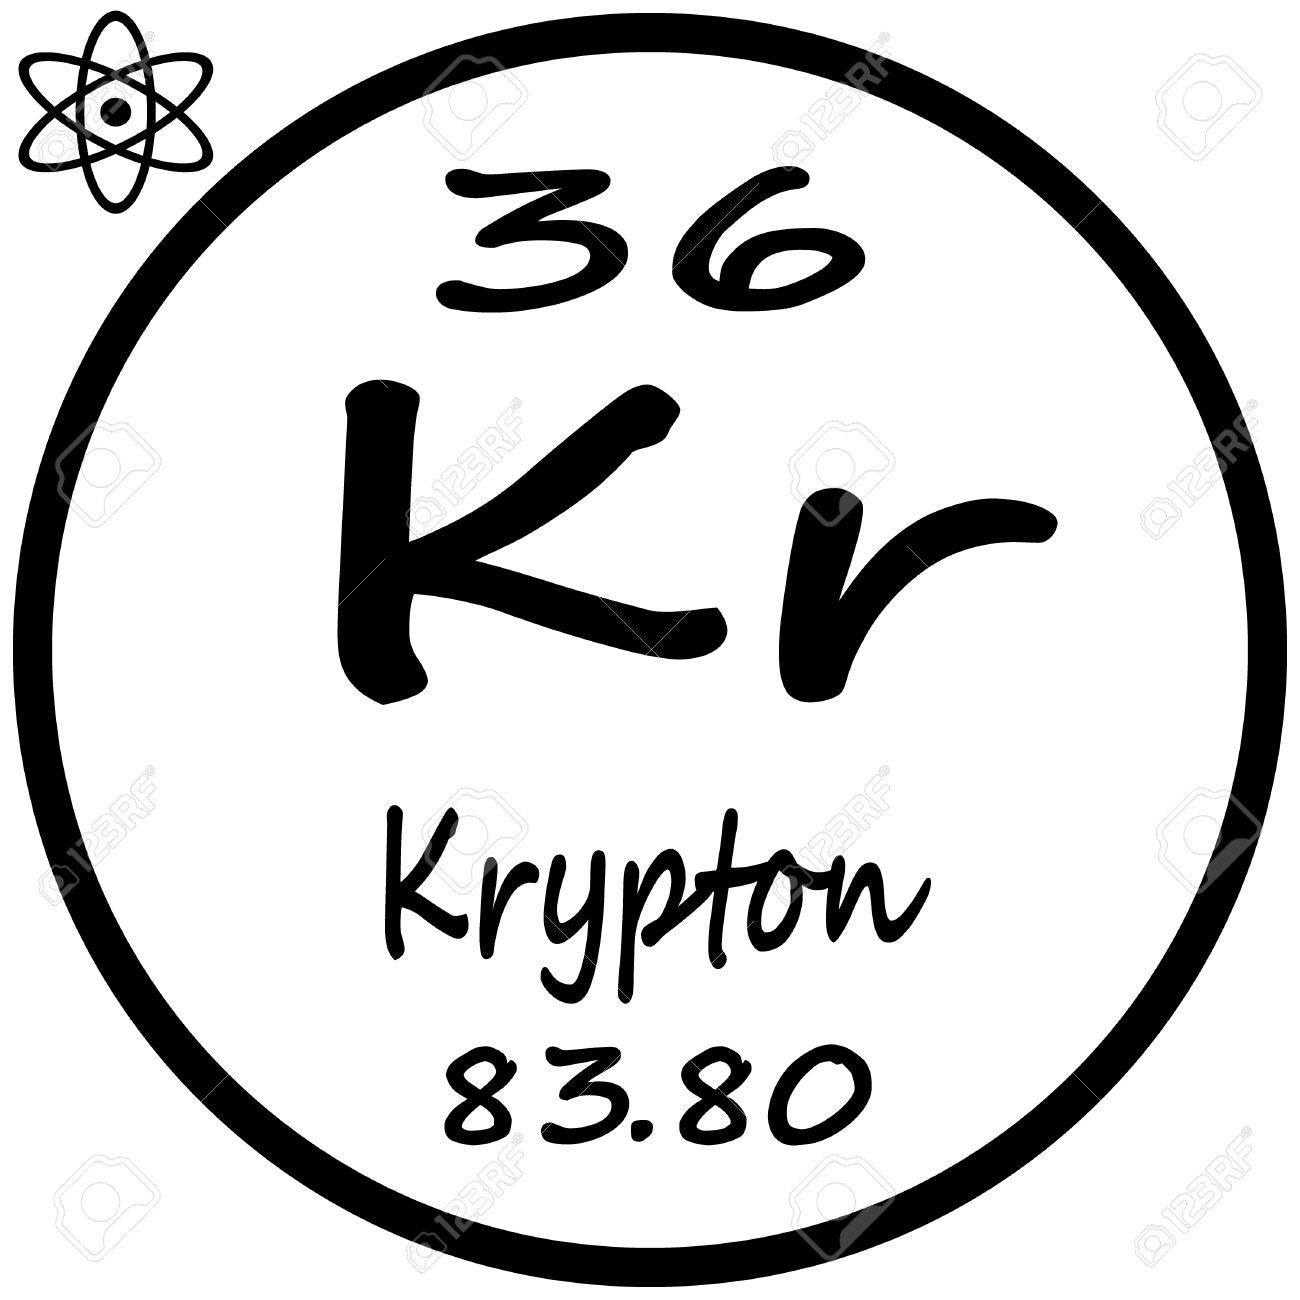 Periodic table of elements krypton royalty free cliparts vectors periodic table of elements krypton stock vector 53482483 urtaz Choice Image